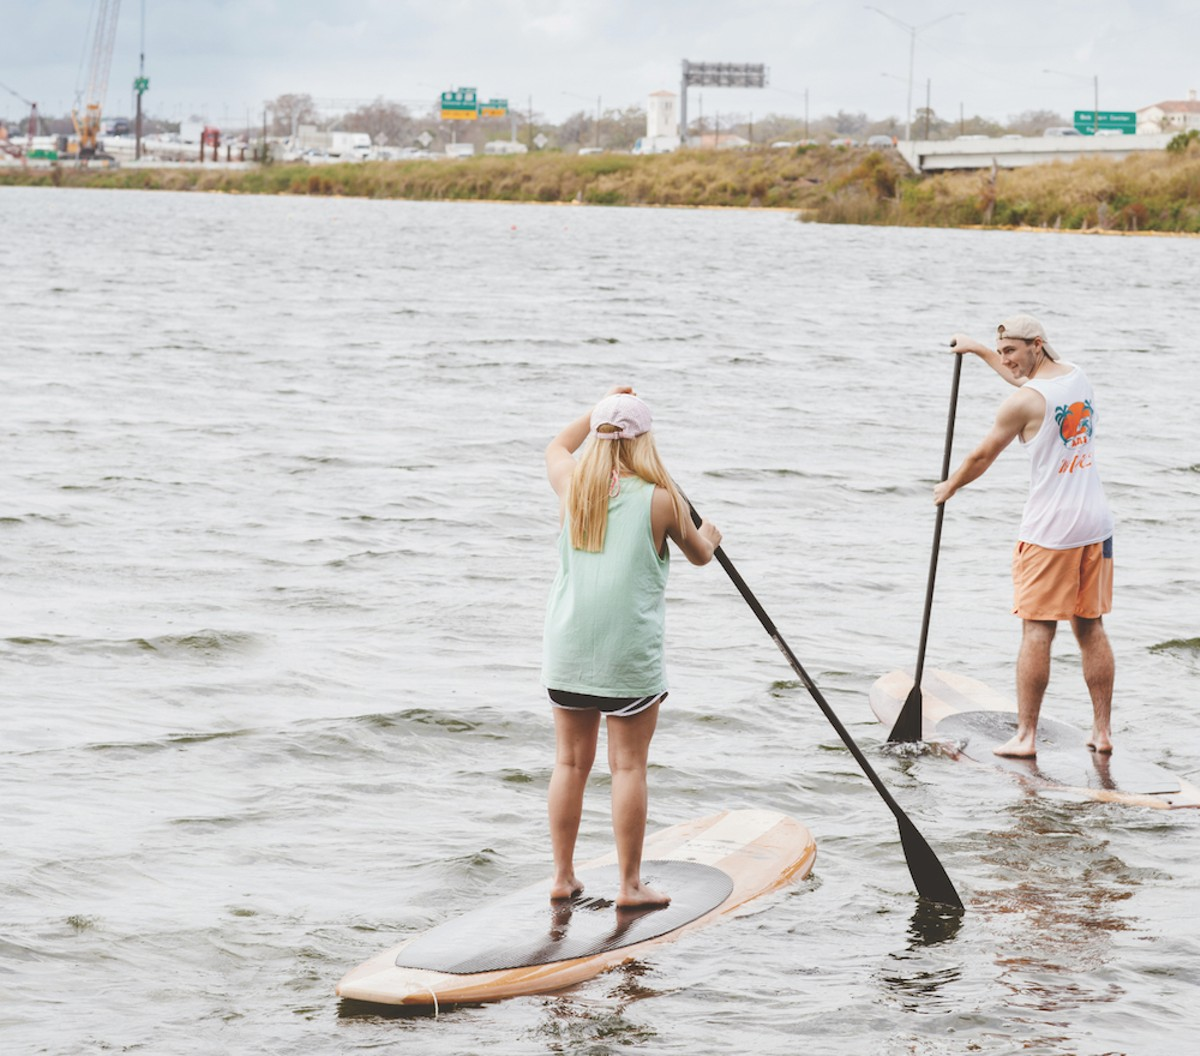 paddleboard-ivanhoe-hand.jpg